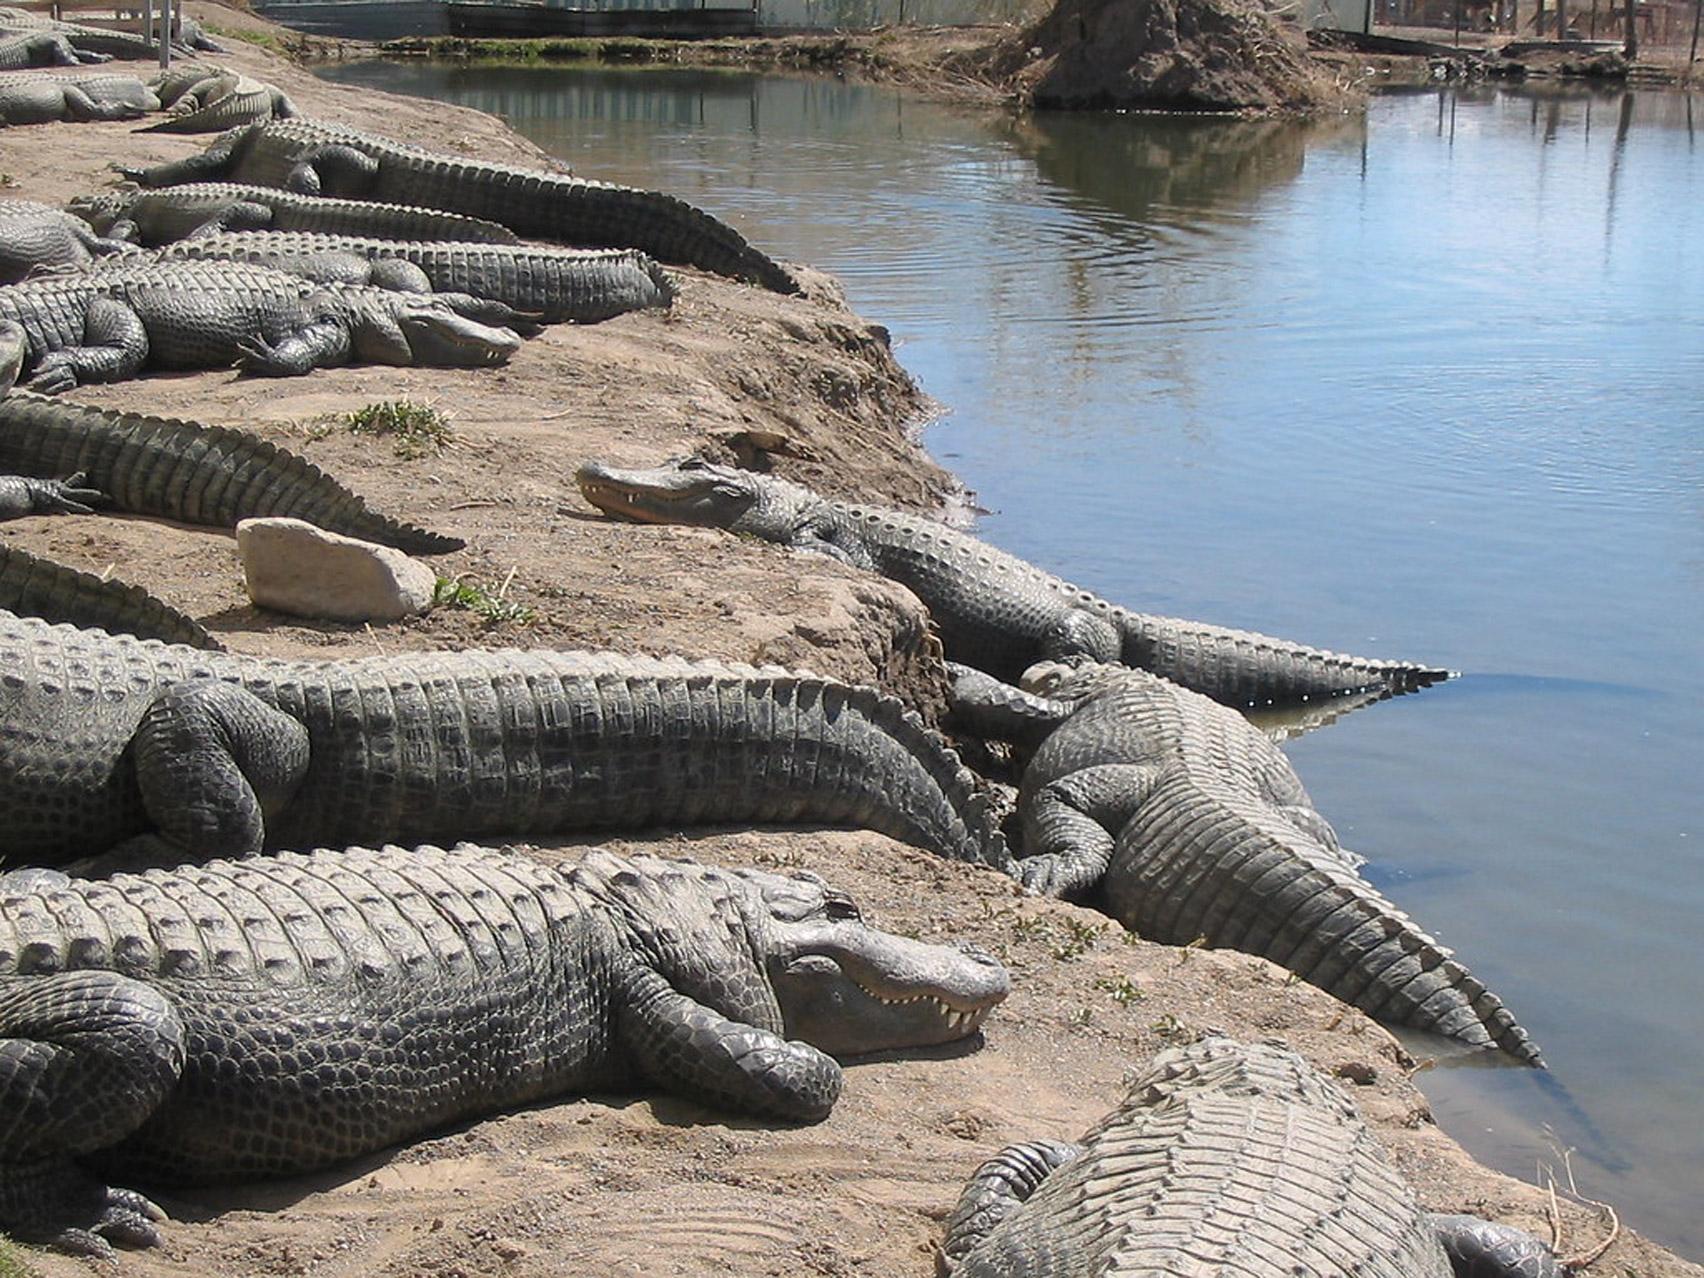 Alligator park in a gas holder by Avanton